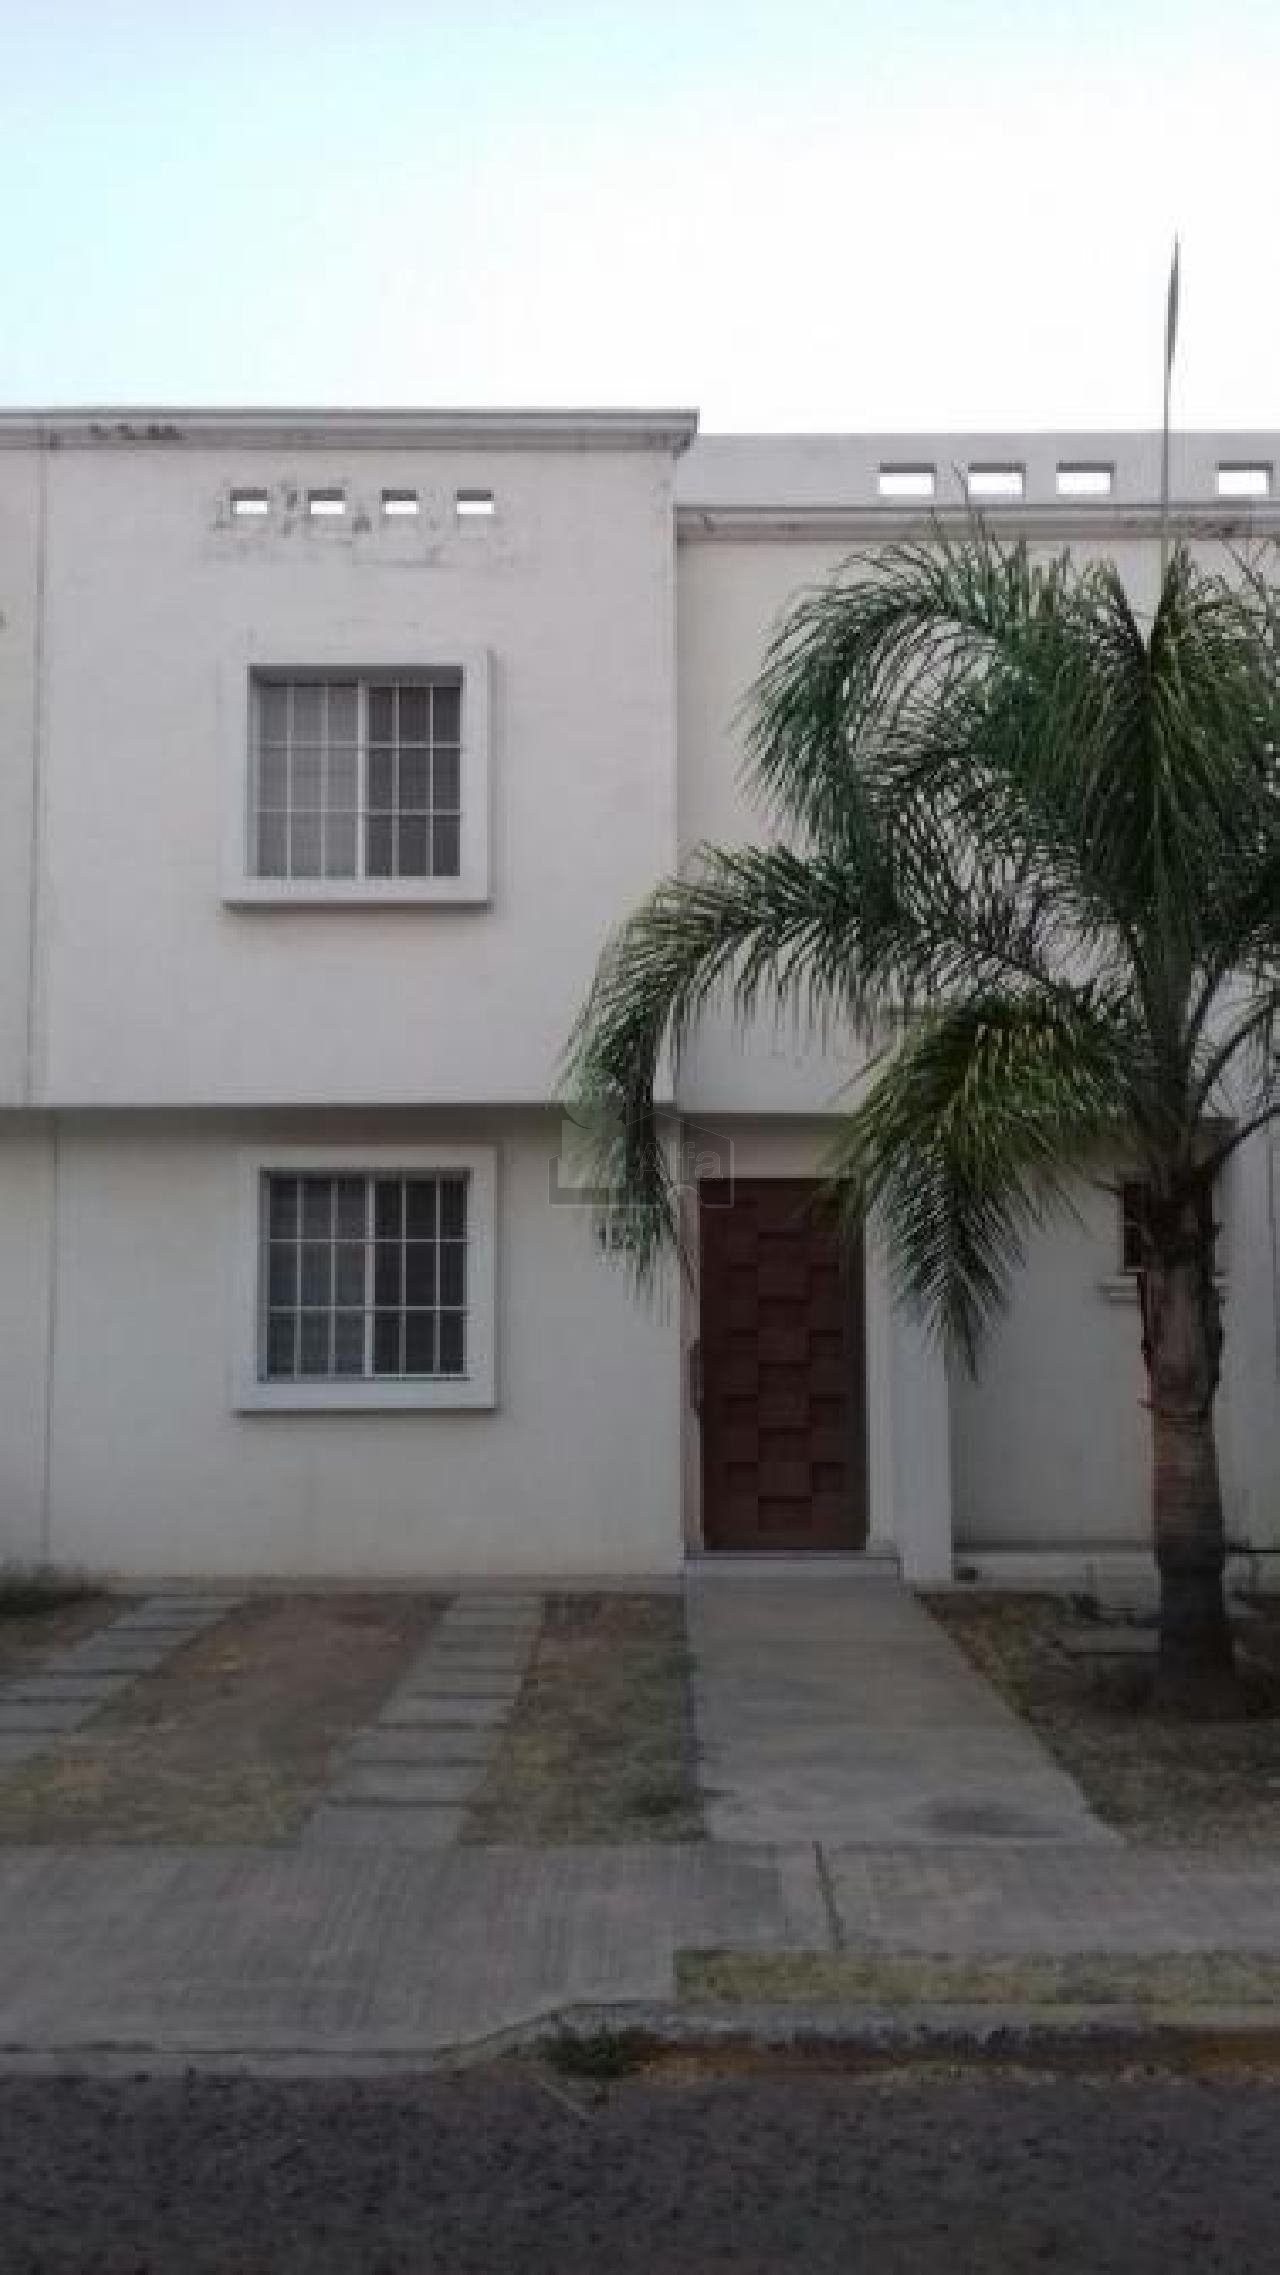 Casas en renta en irapuato guanajuato 21 registros for Casas en renta en irapuato